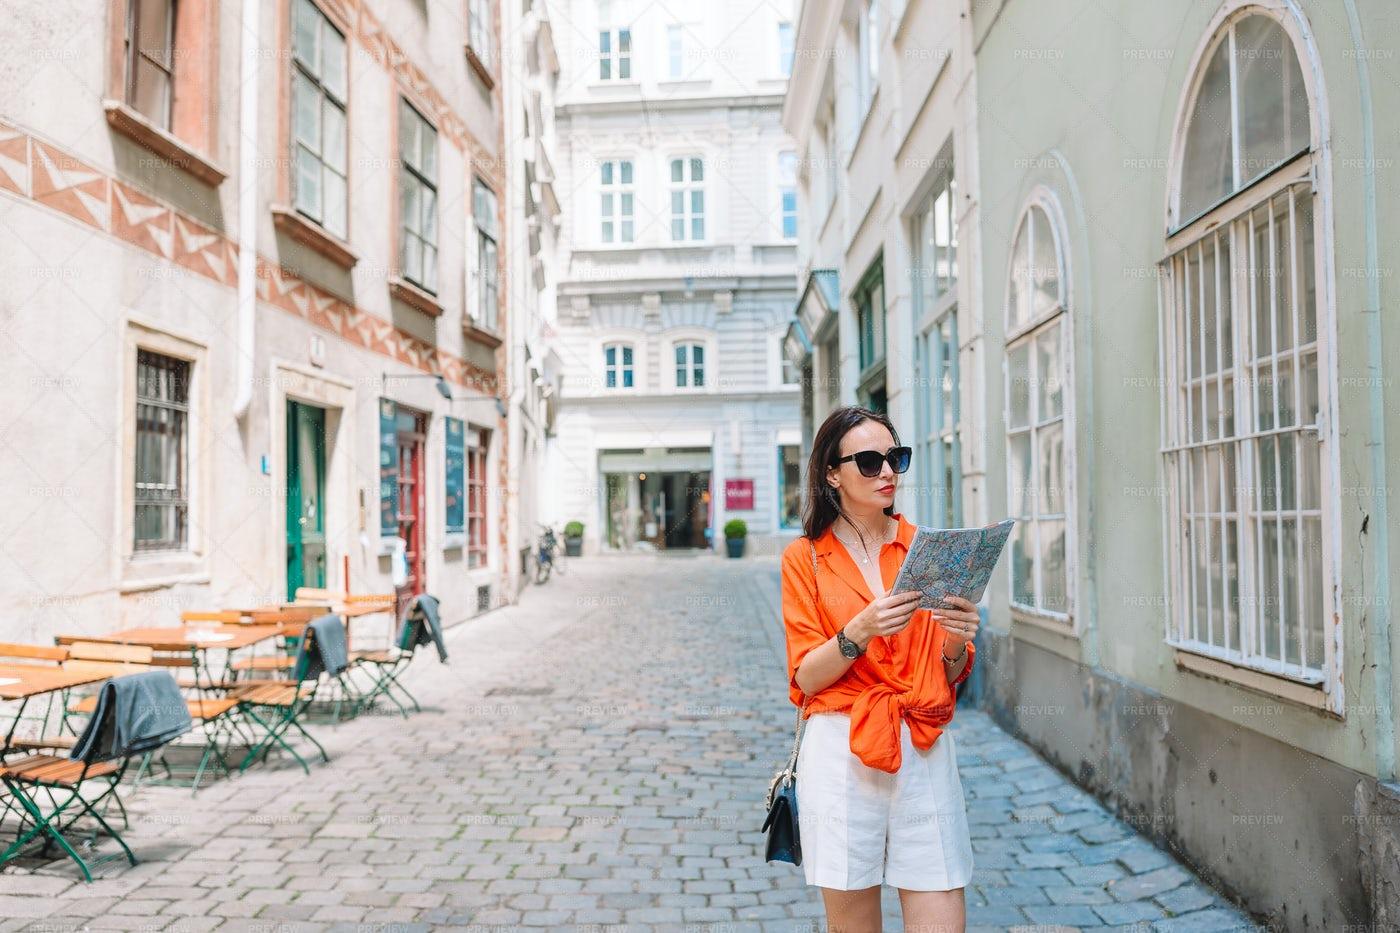 Tourist Holding A Map: Stock Photos